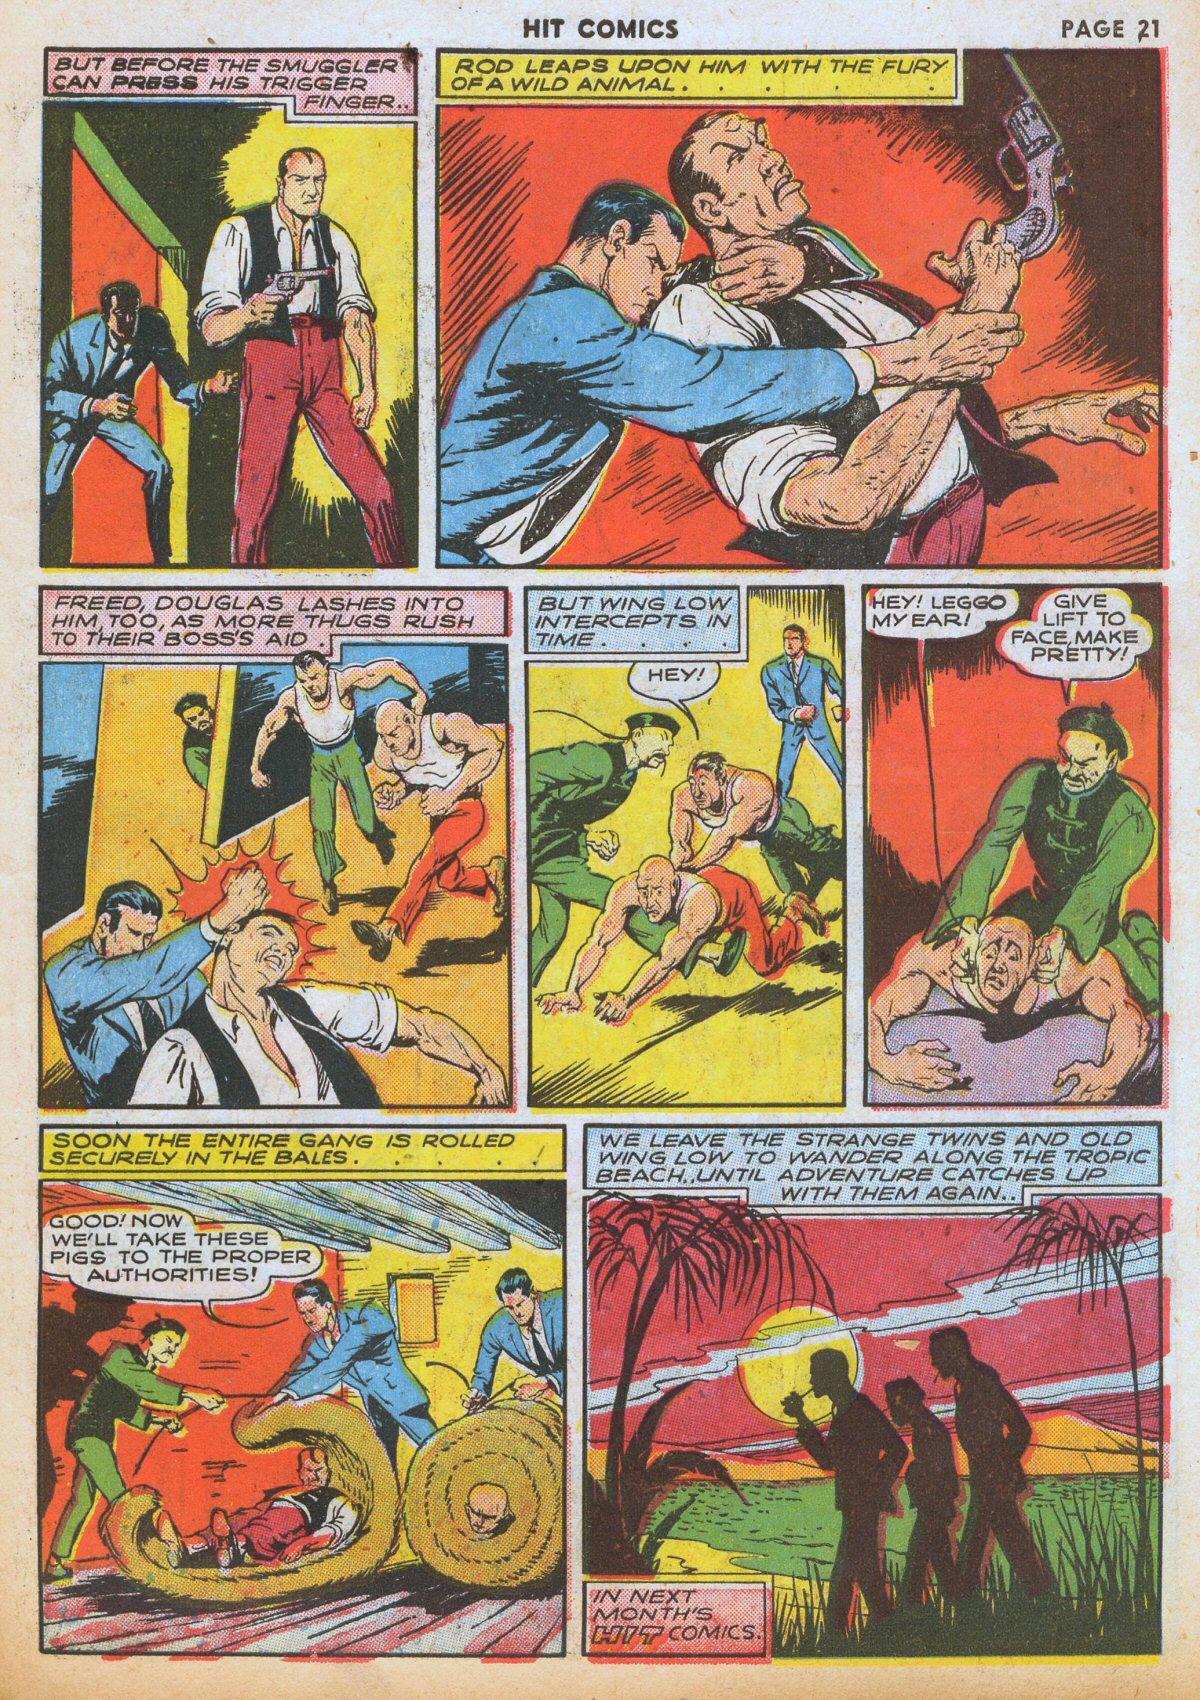 Read online Hit Comics comic -  Issue #12 - 23